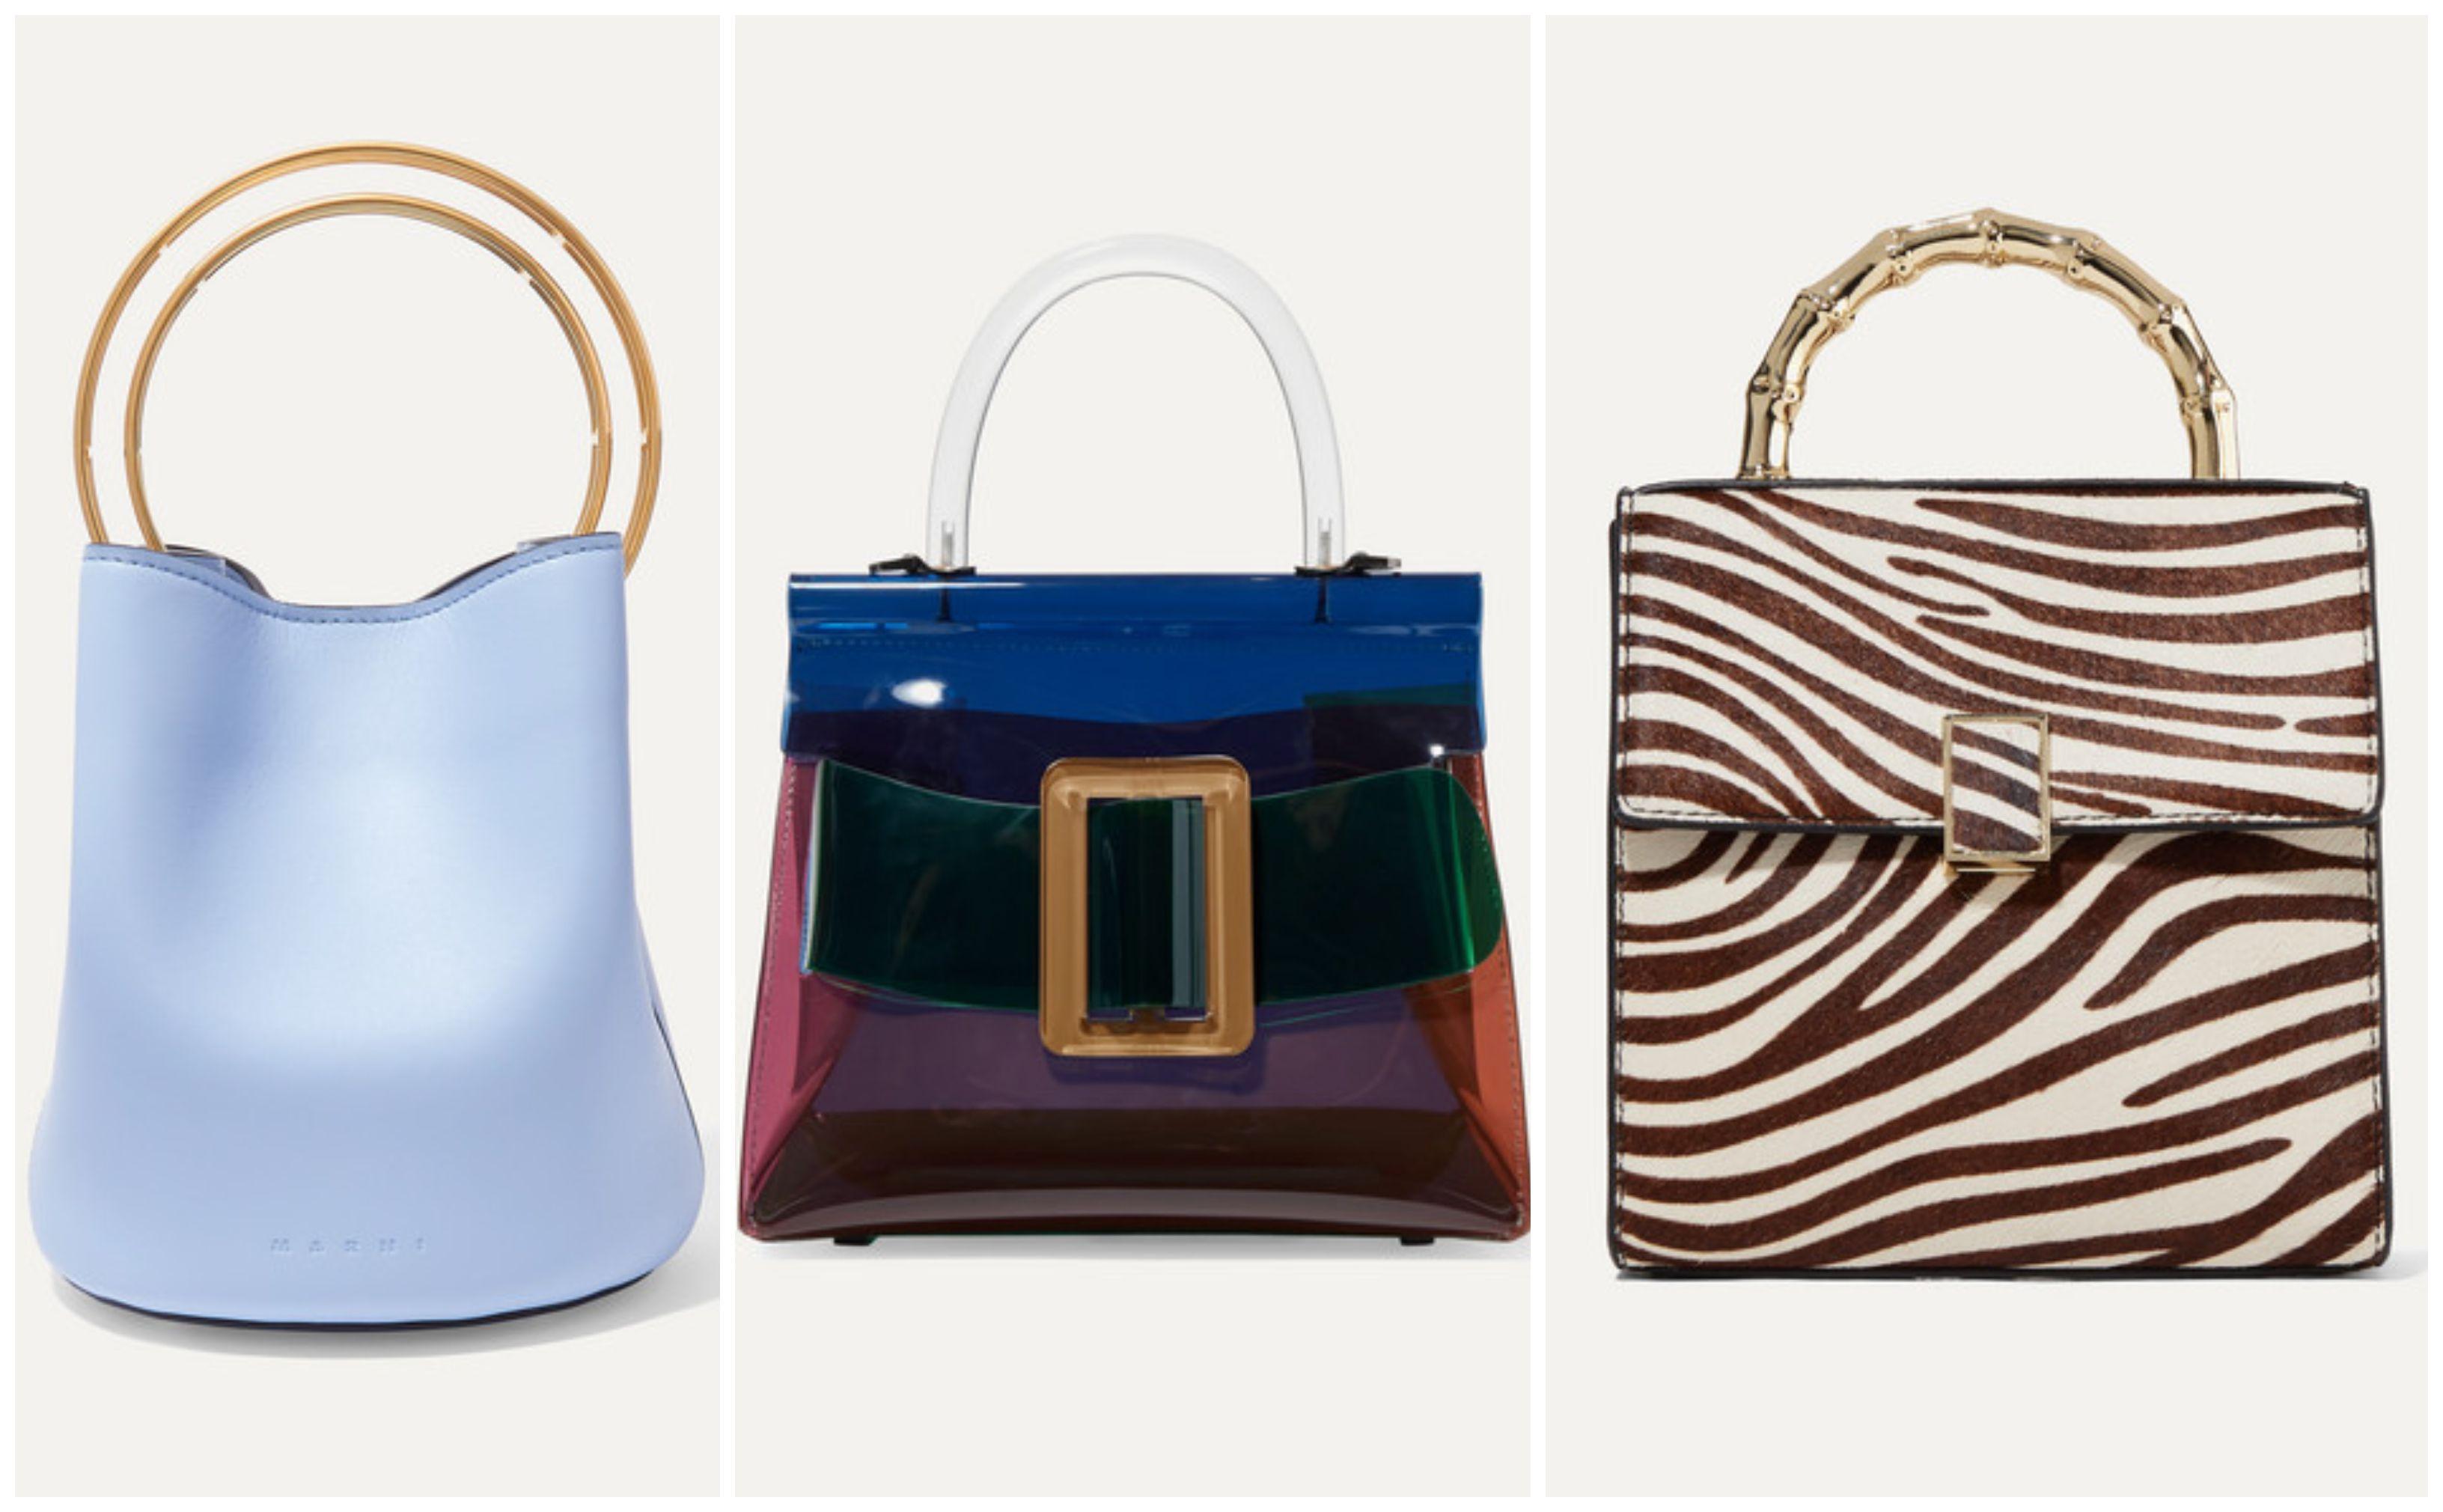 Net-a-Porter ima predivnu ponudu dizajnerskih torbica na sniženju! Izabrali smo najljepše